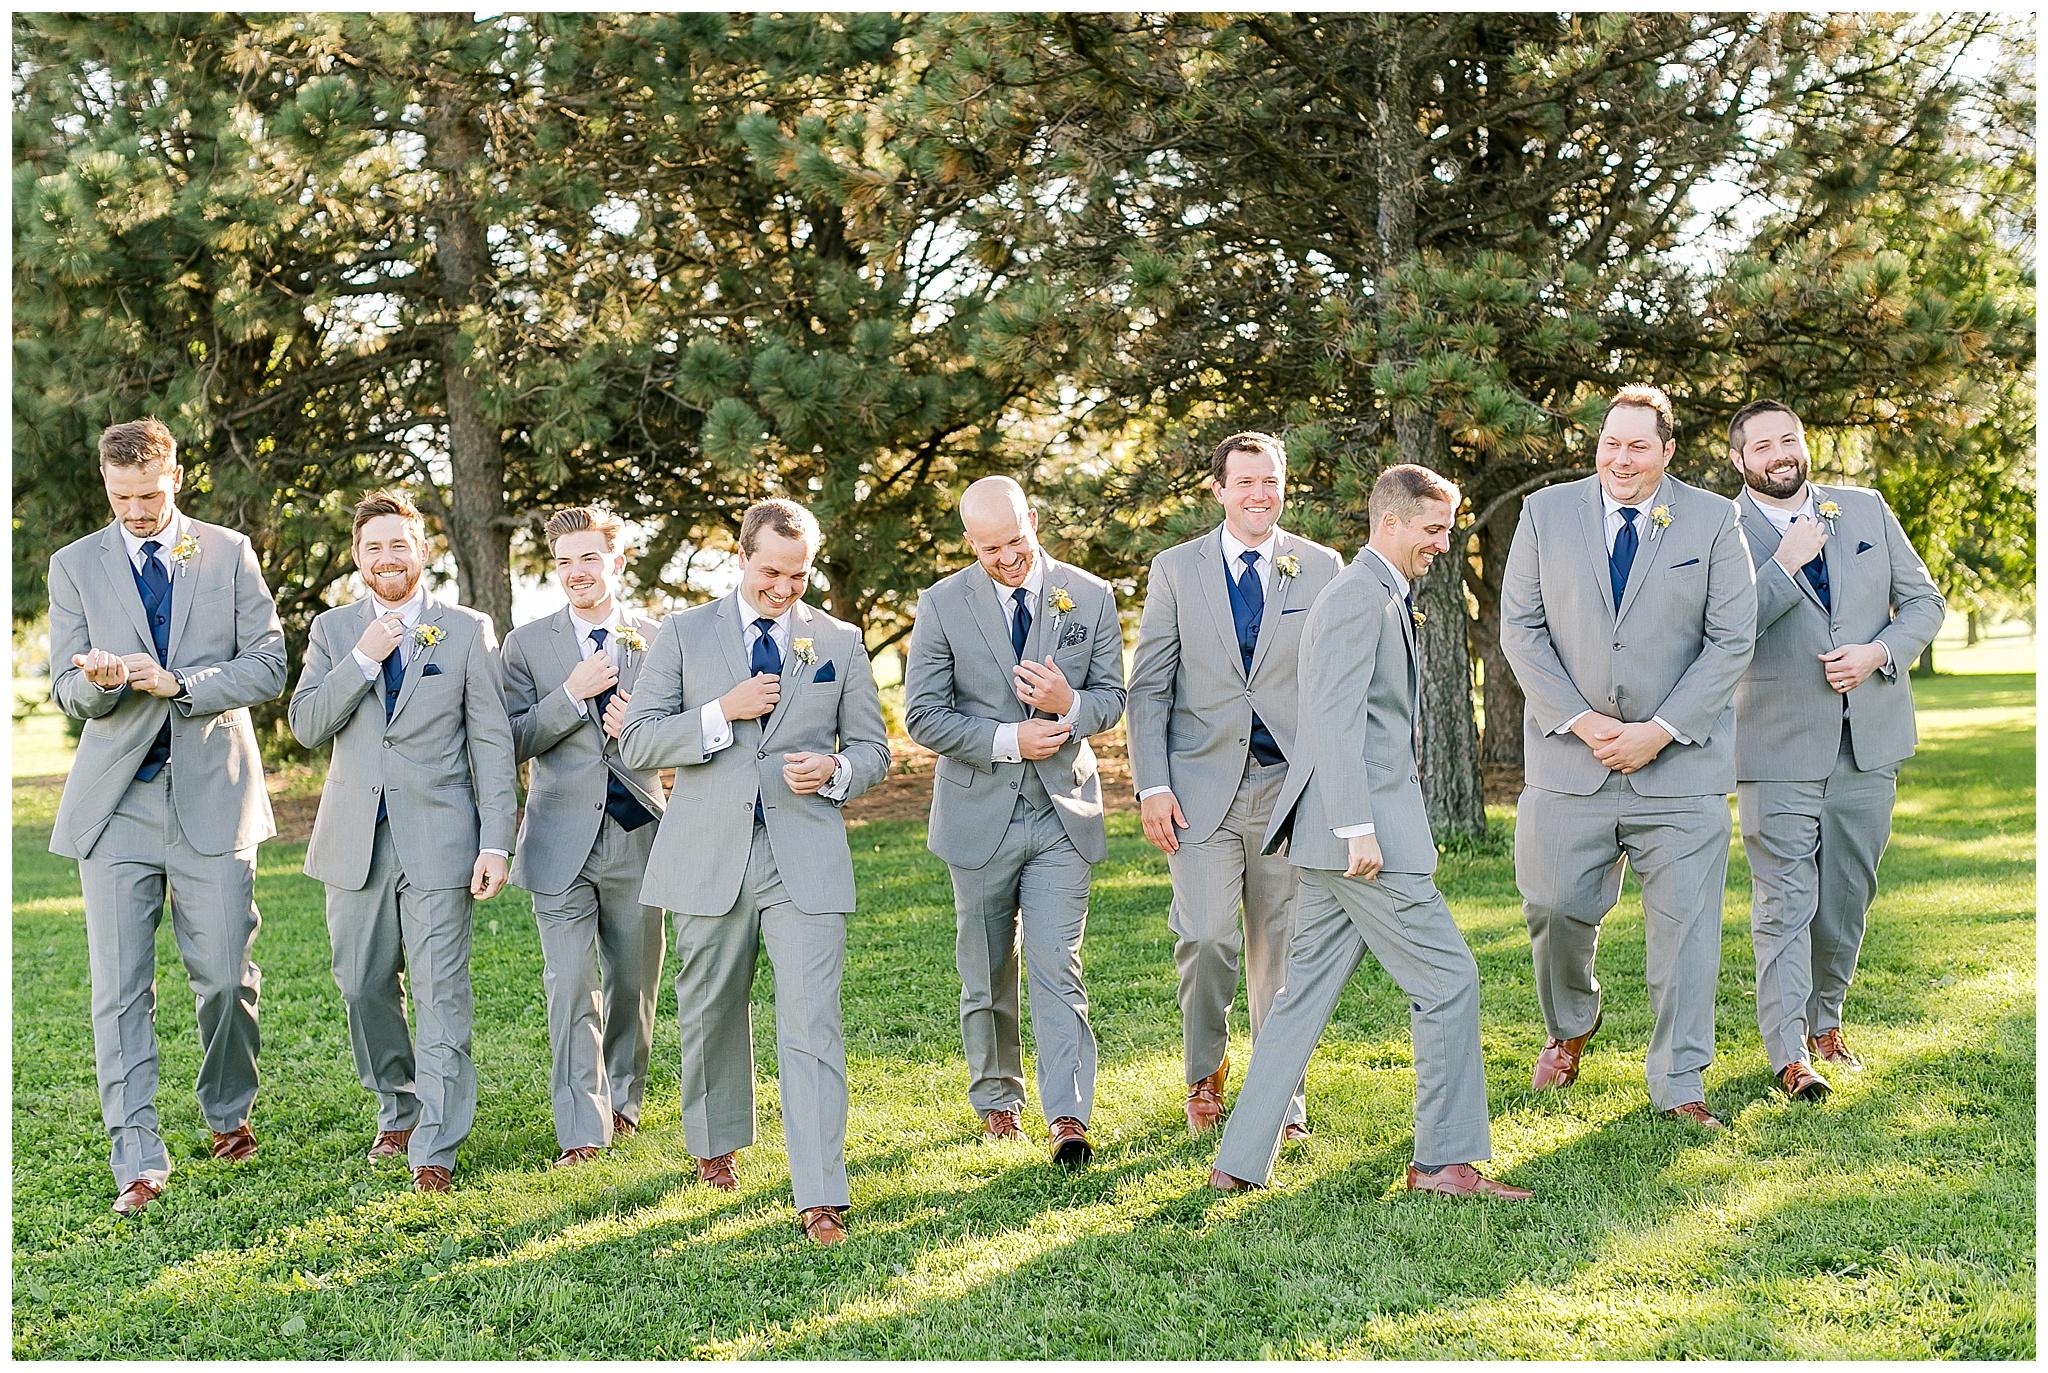 Venue_at_Milwaukee_Brewing_Company_wedding_milwaukee_wisconsin_0350.jpg